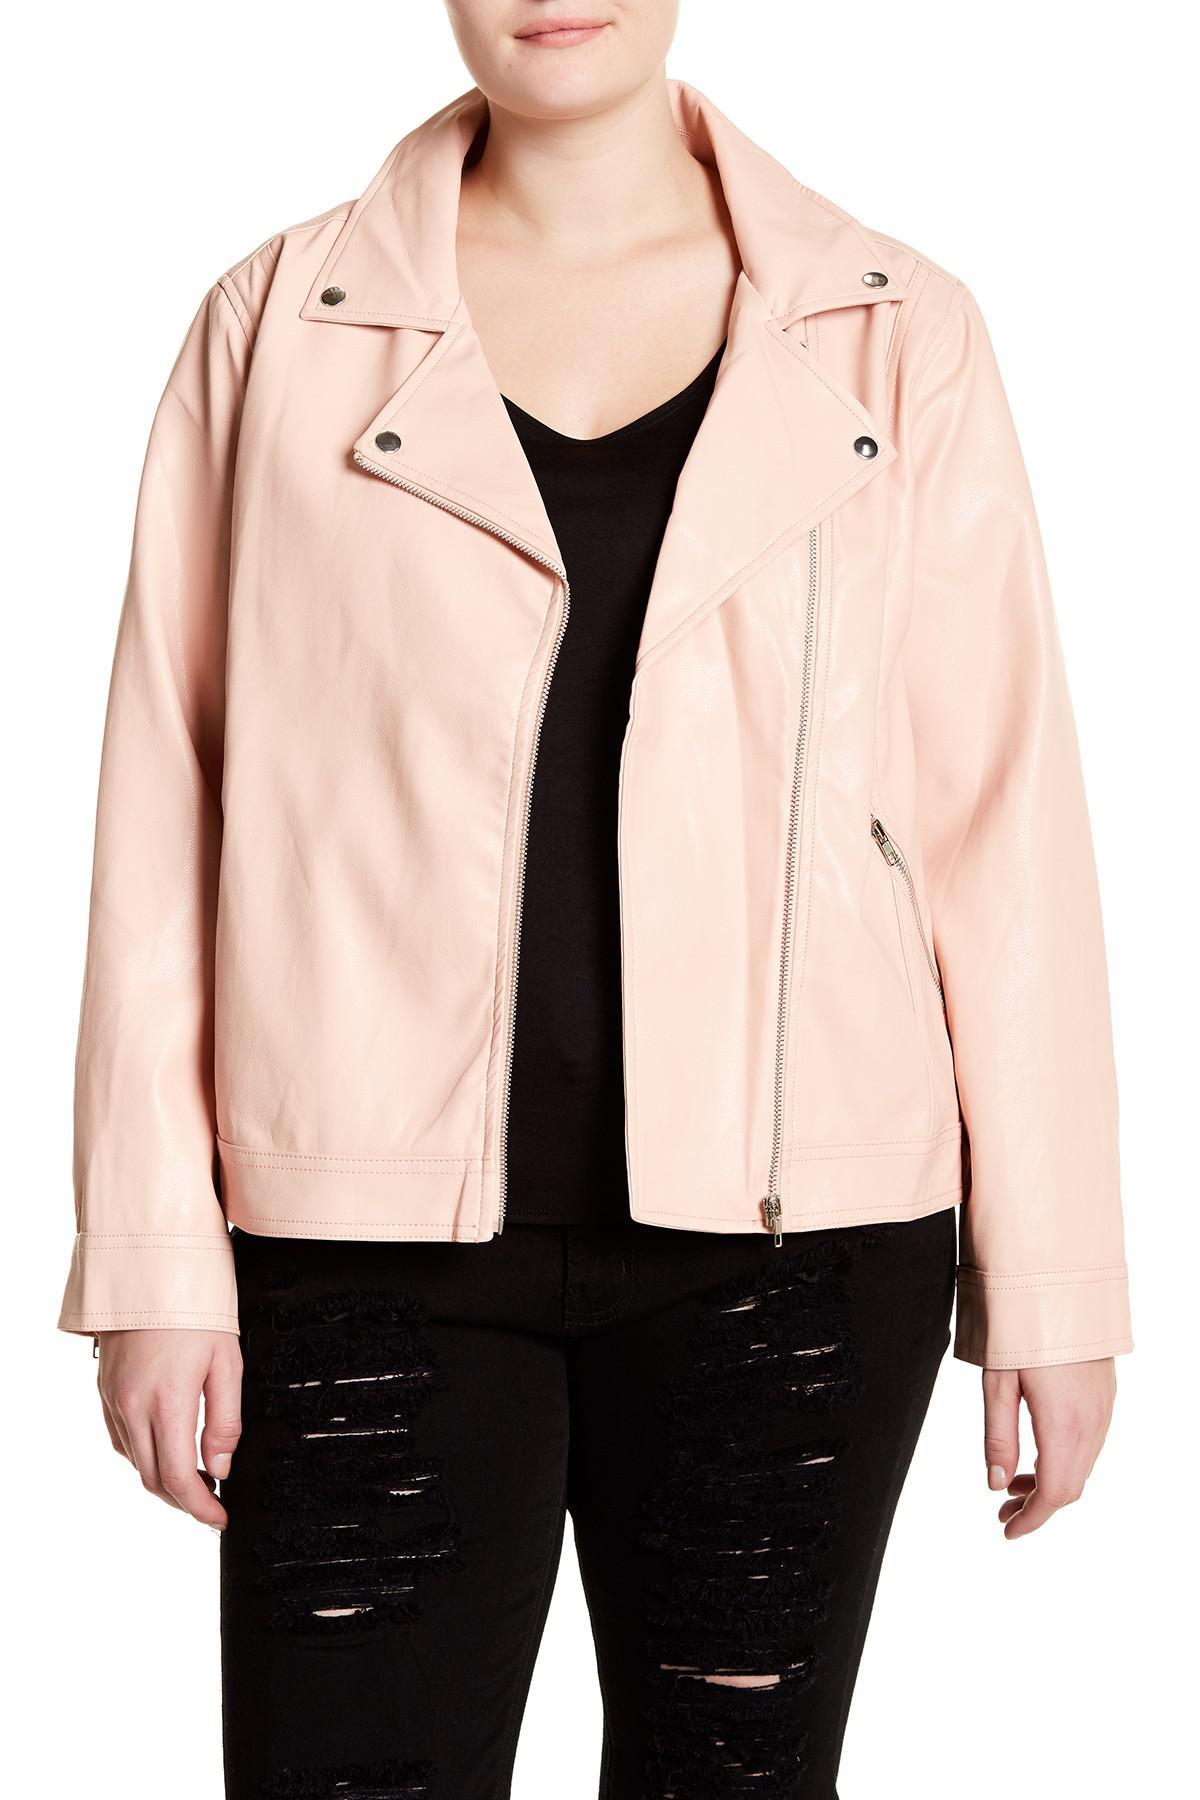 Lyst - Blu Pepper Faux Leather Moto Jacket (plus Size) in Pink